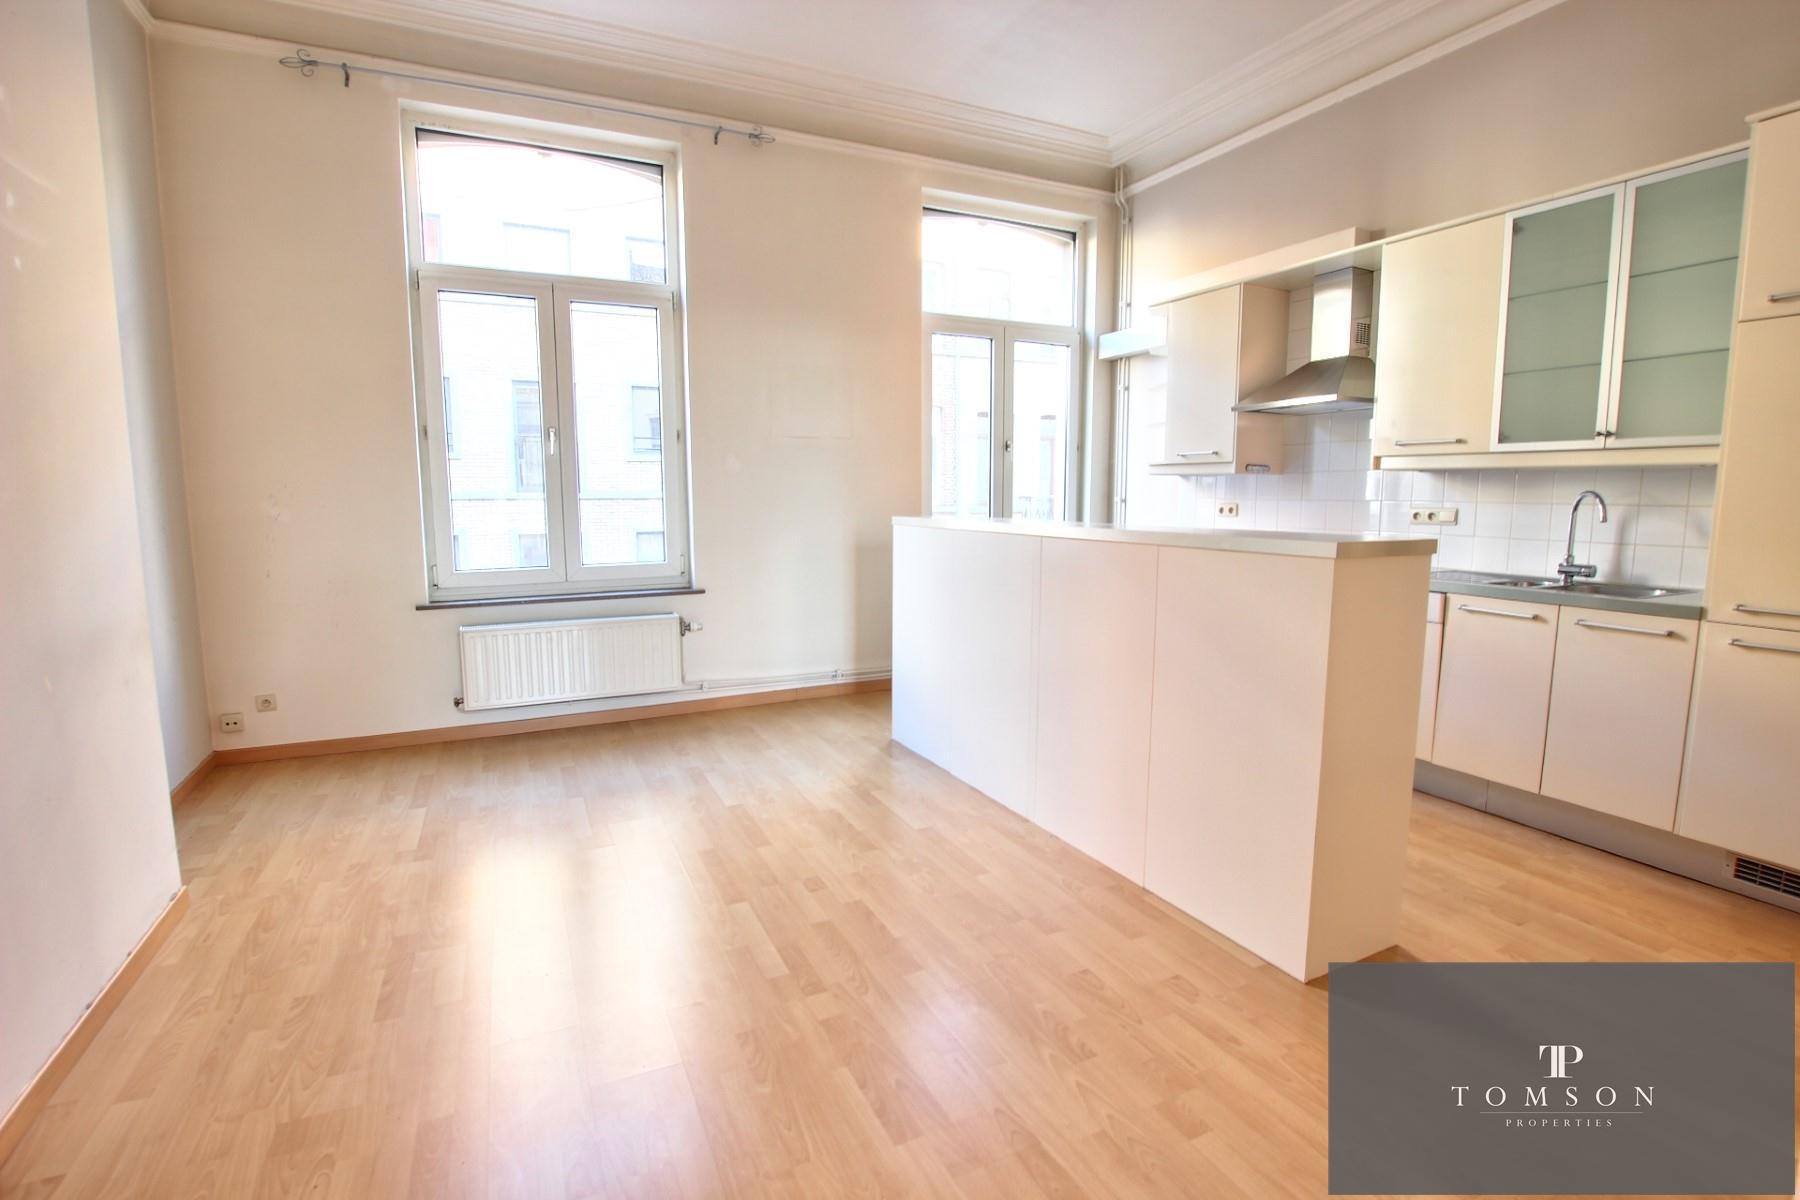 Flat - Etterbeek - #4130587-1